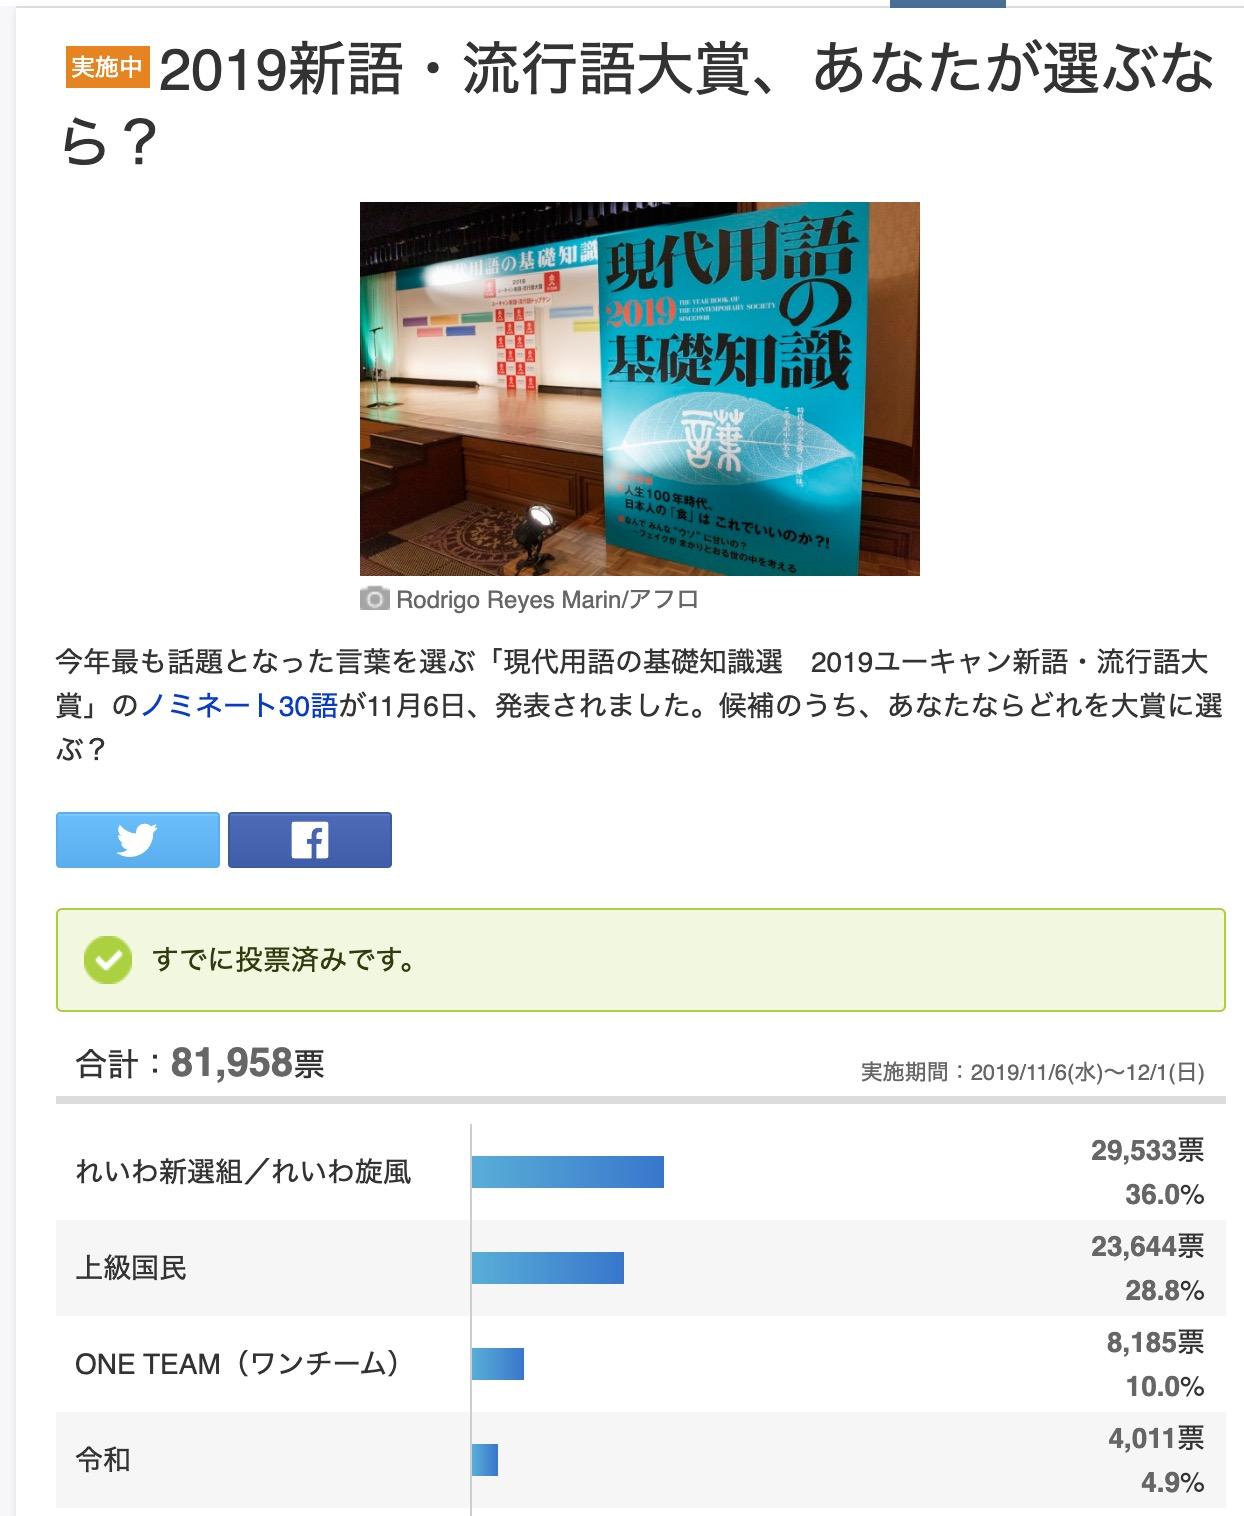 https://news.yahoo.co.jp/polls/life/40024/result